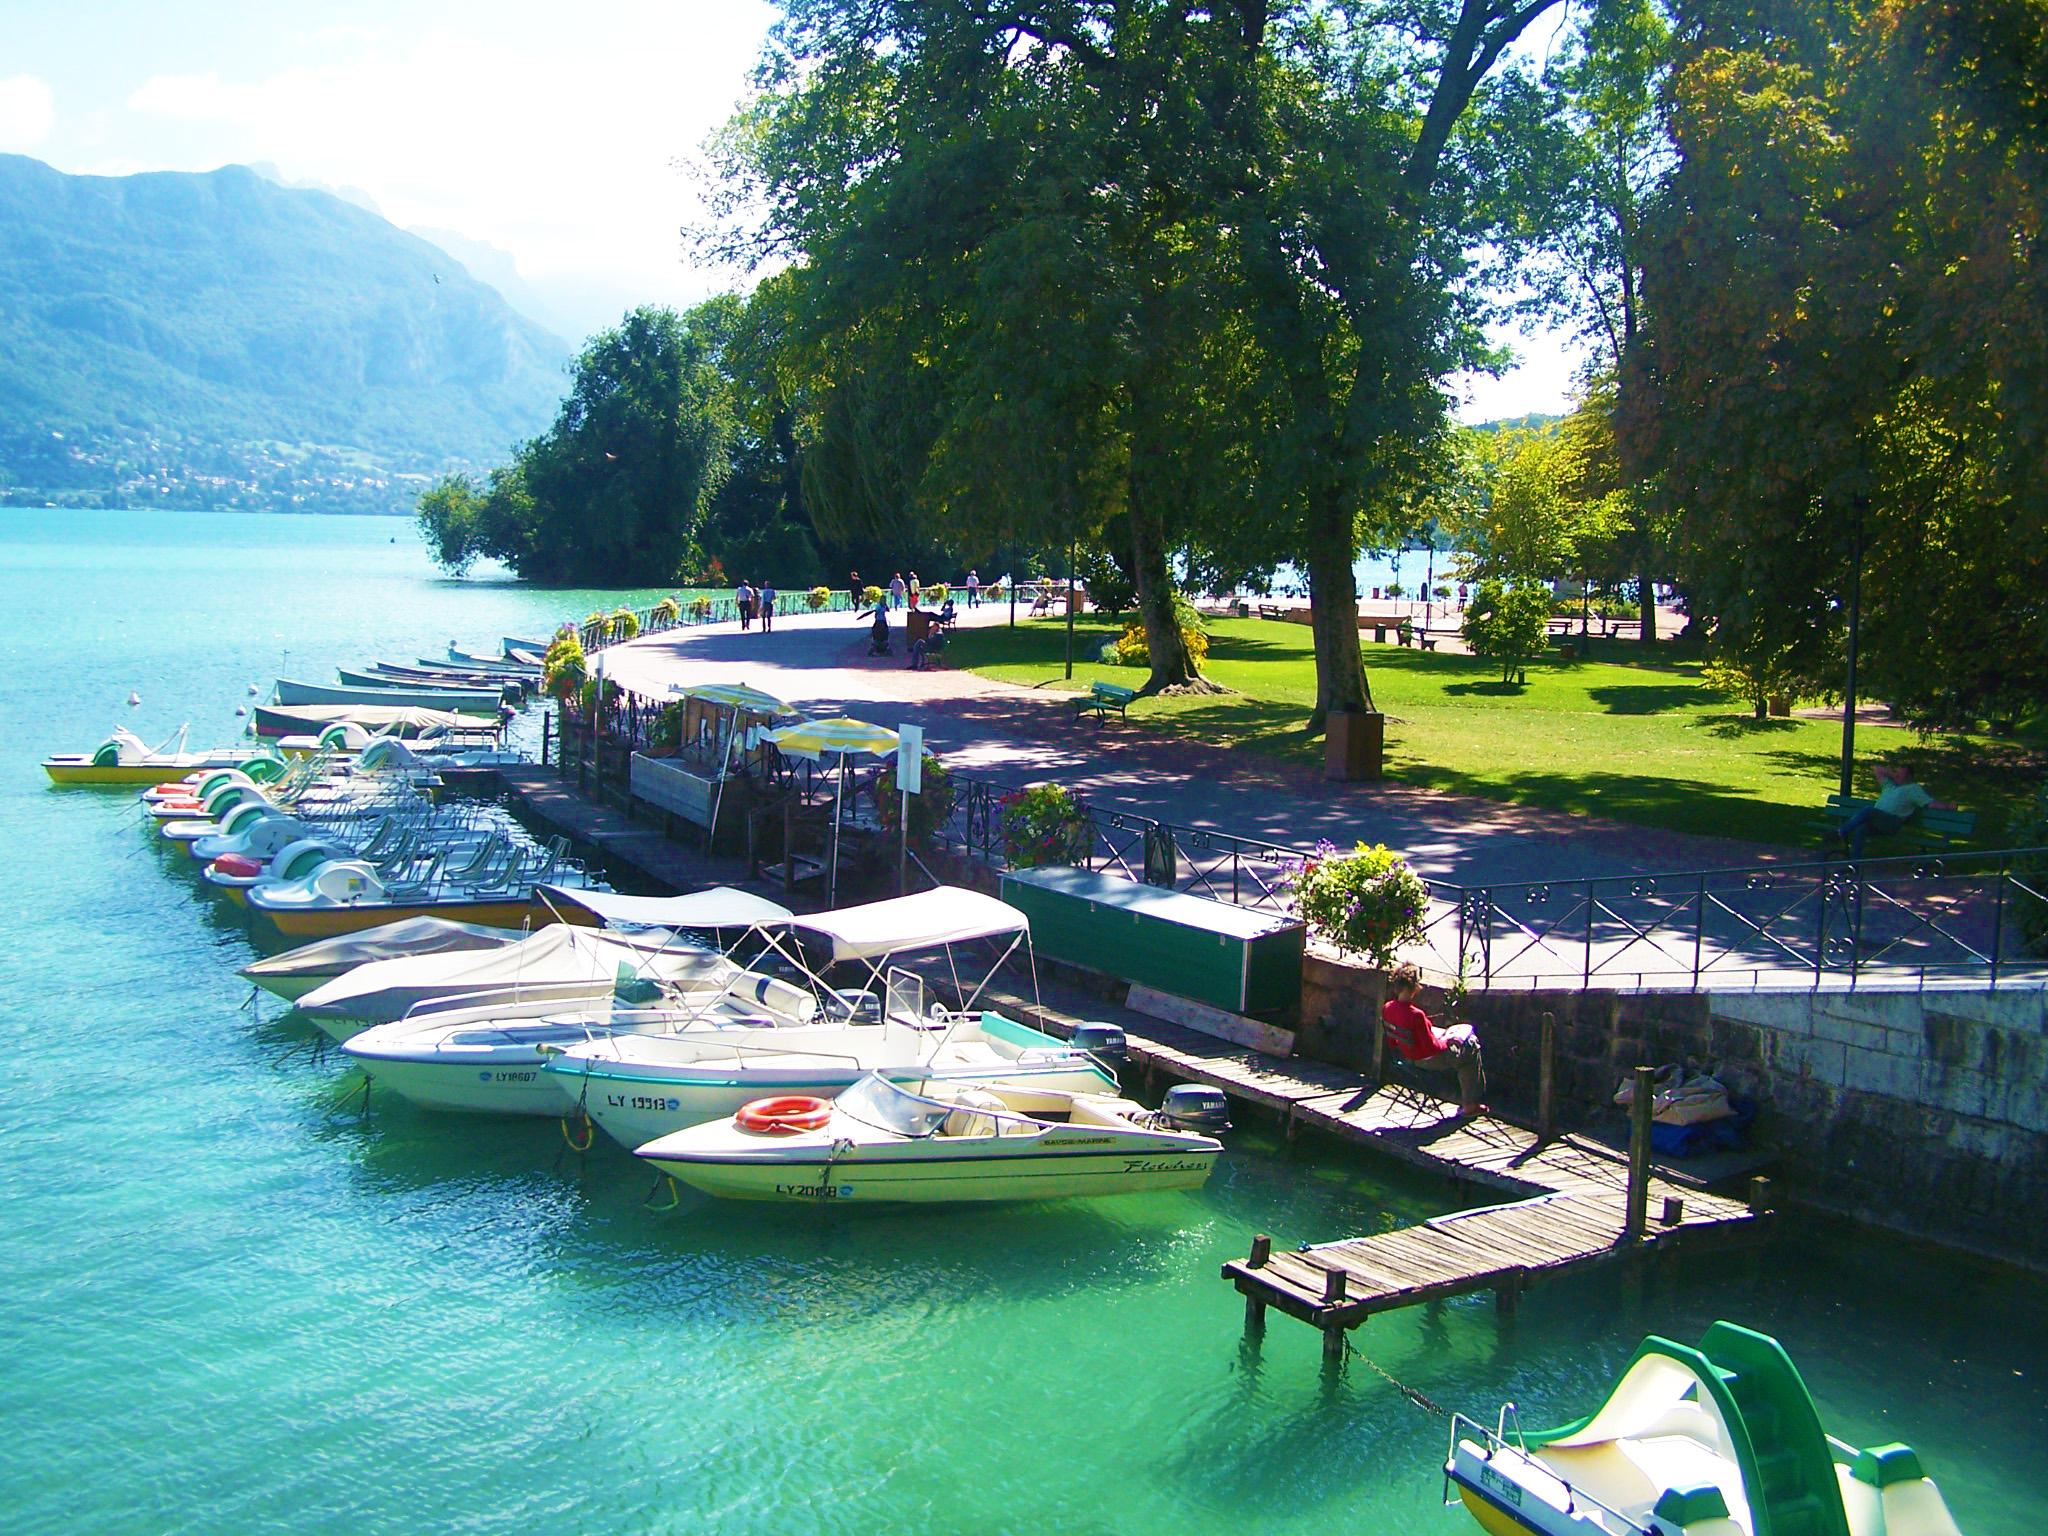 kt_2020_370_Keytours_excursions_Swisstours_annecy_jardin_de_l'europe2_2048_10